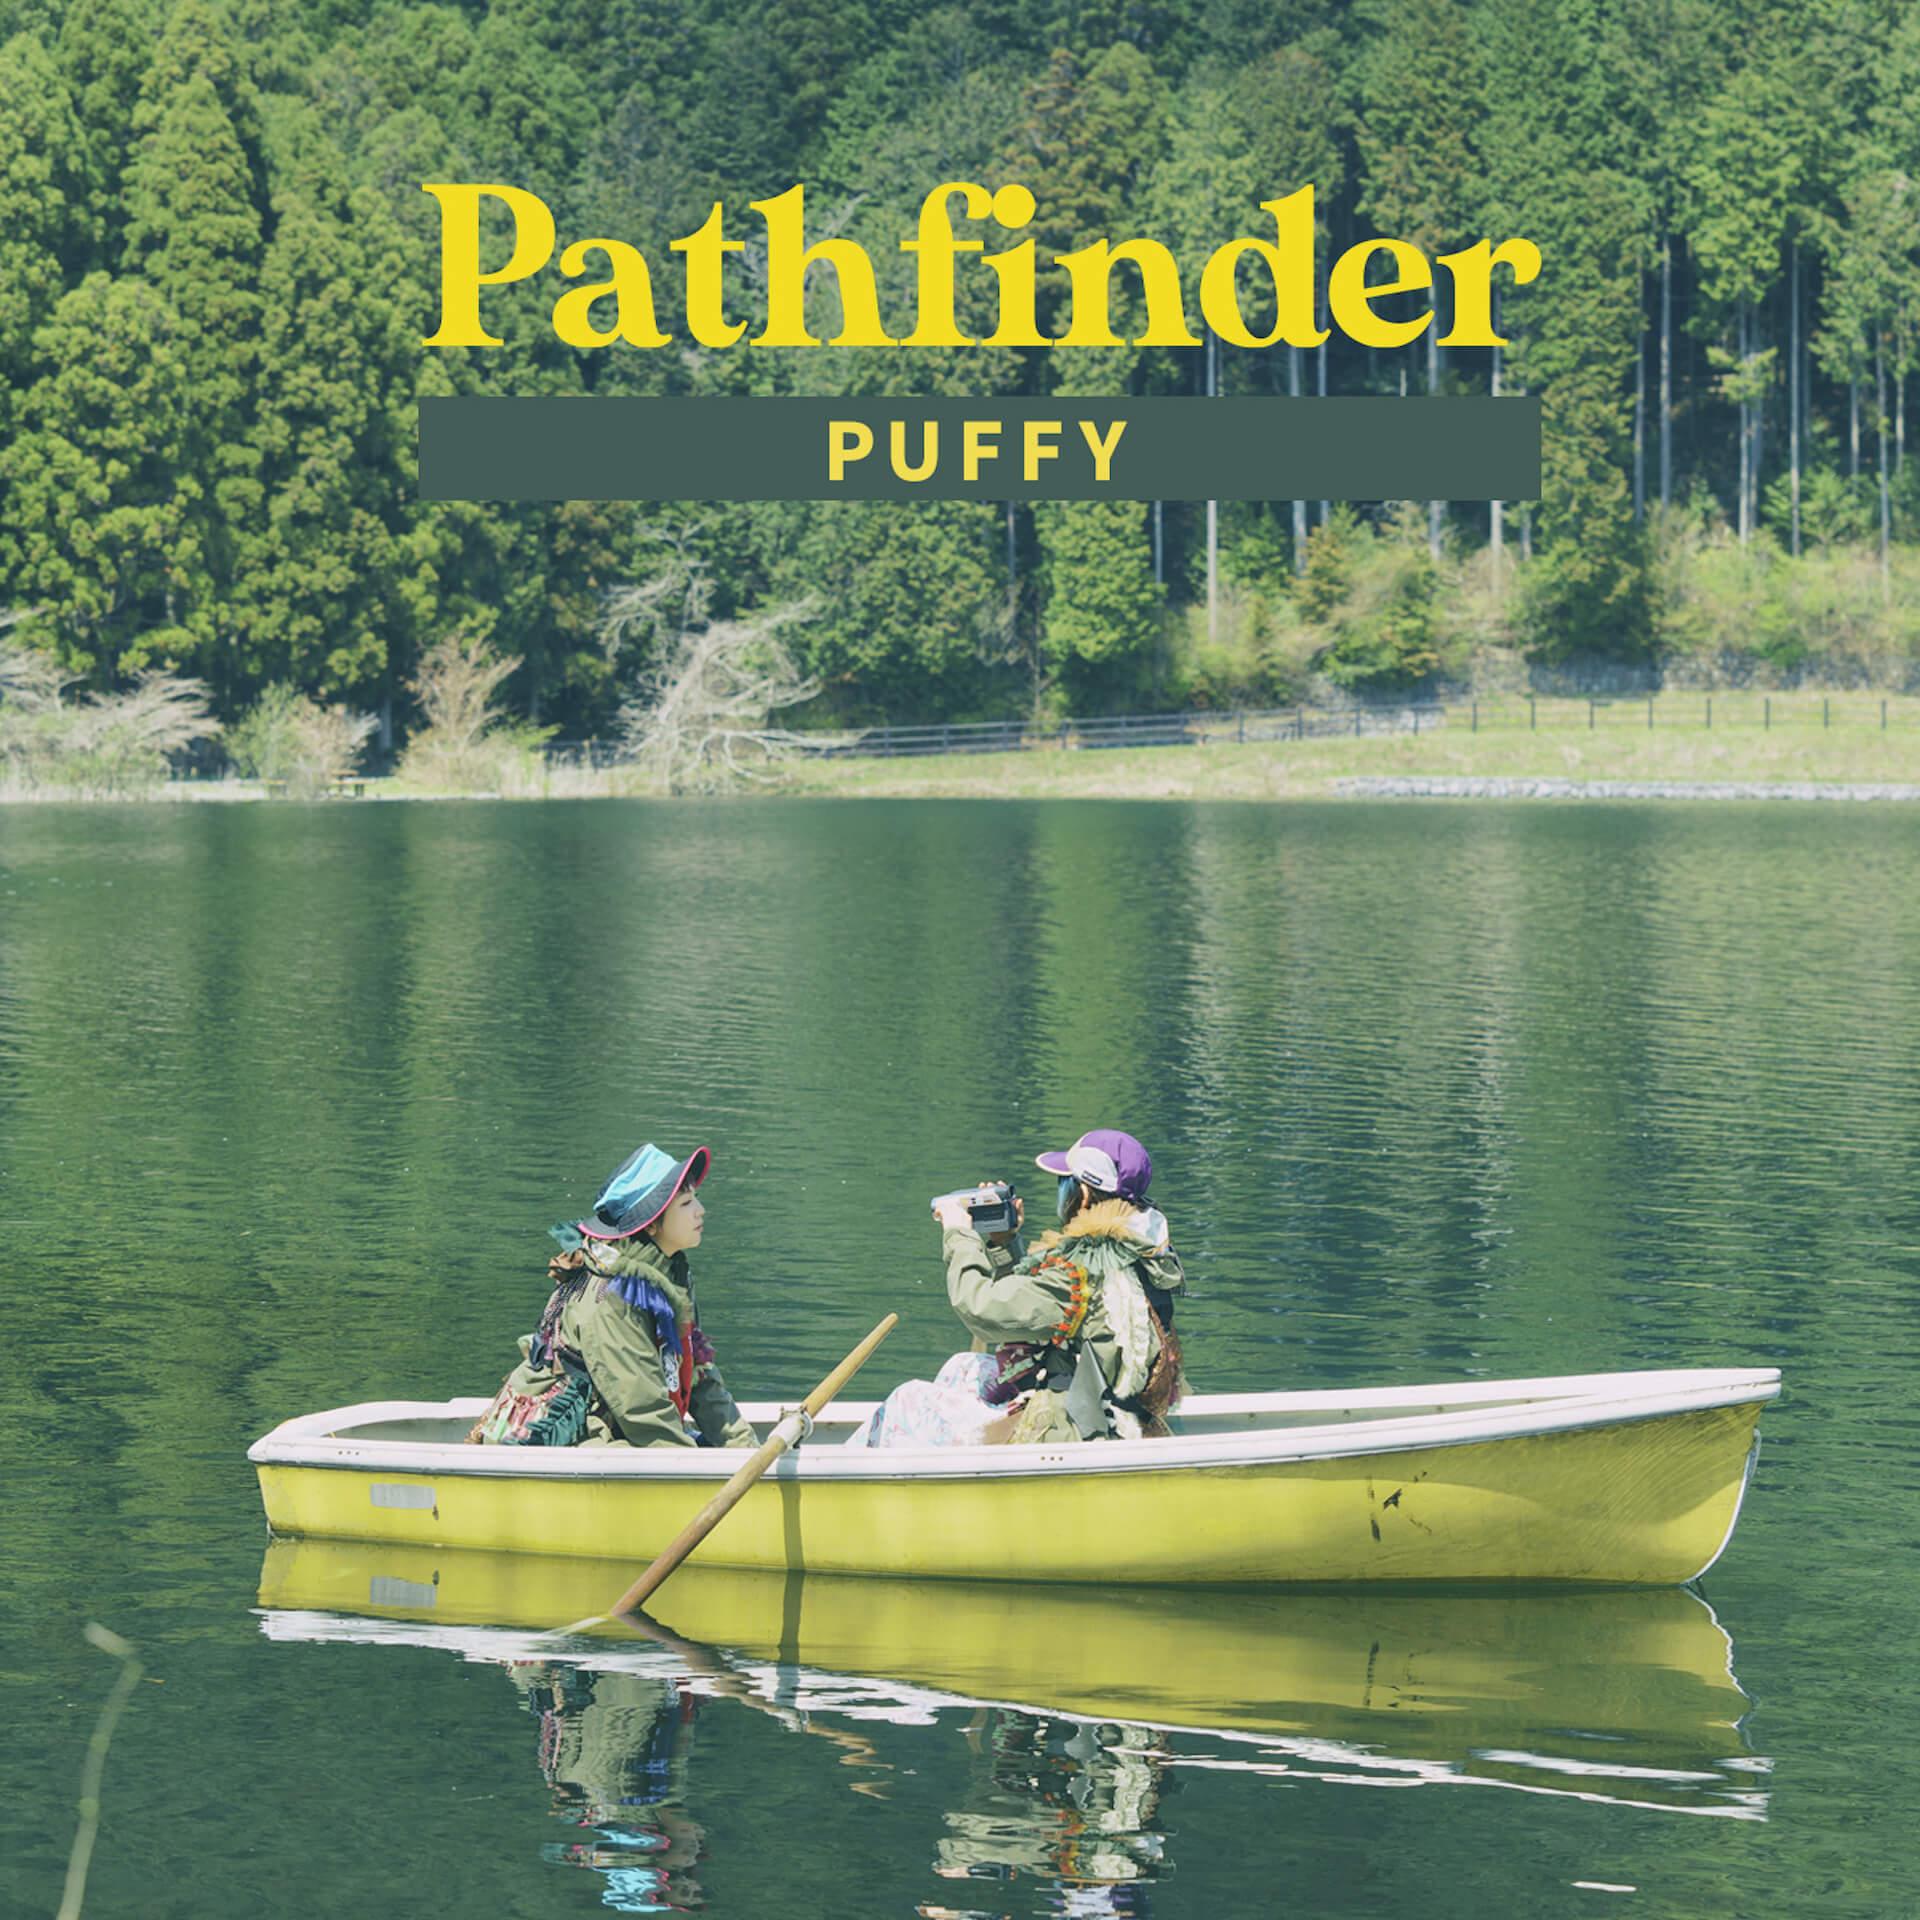 "PUFFYがコロンビア「ESCAPE with Columbia」のコンセプトをテーマにした楽曲""Pathfinder""を発表!作編曲に生形真一 music210428_columbia-puffy-210428_1"